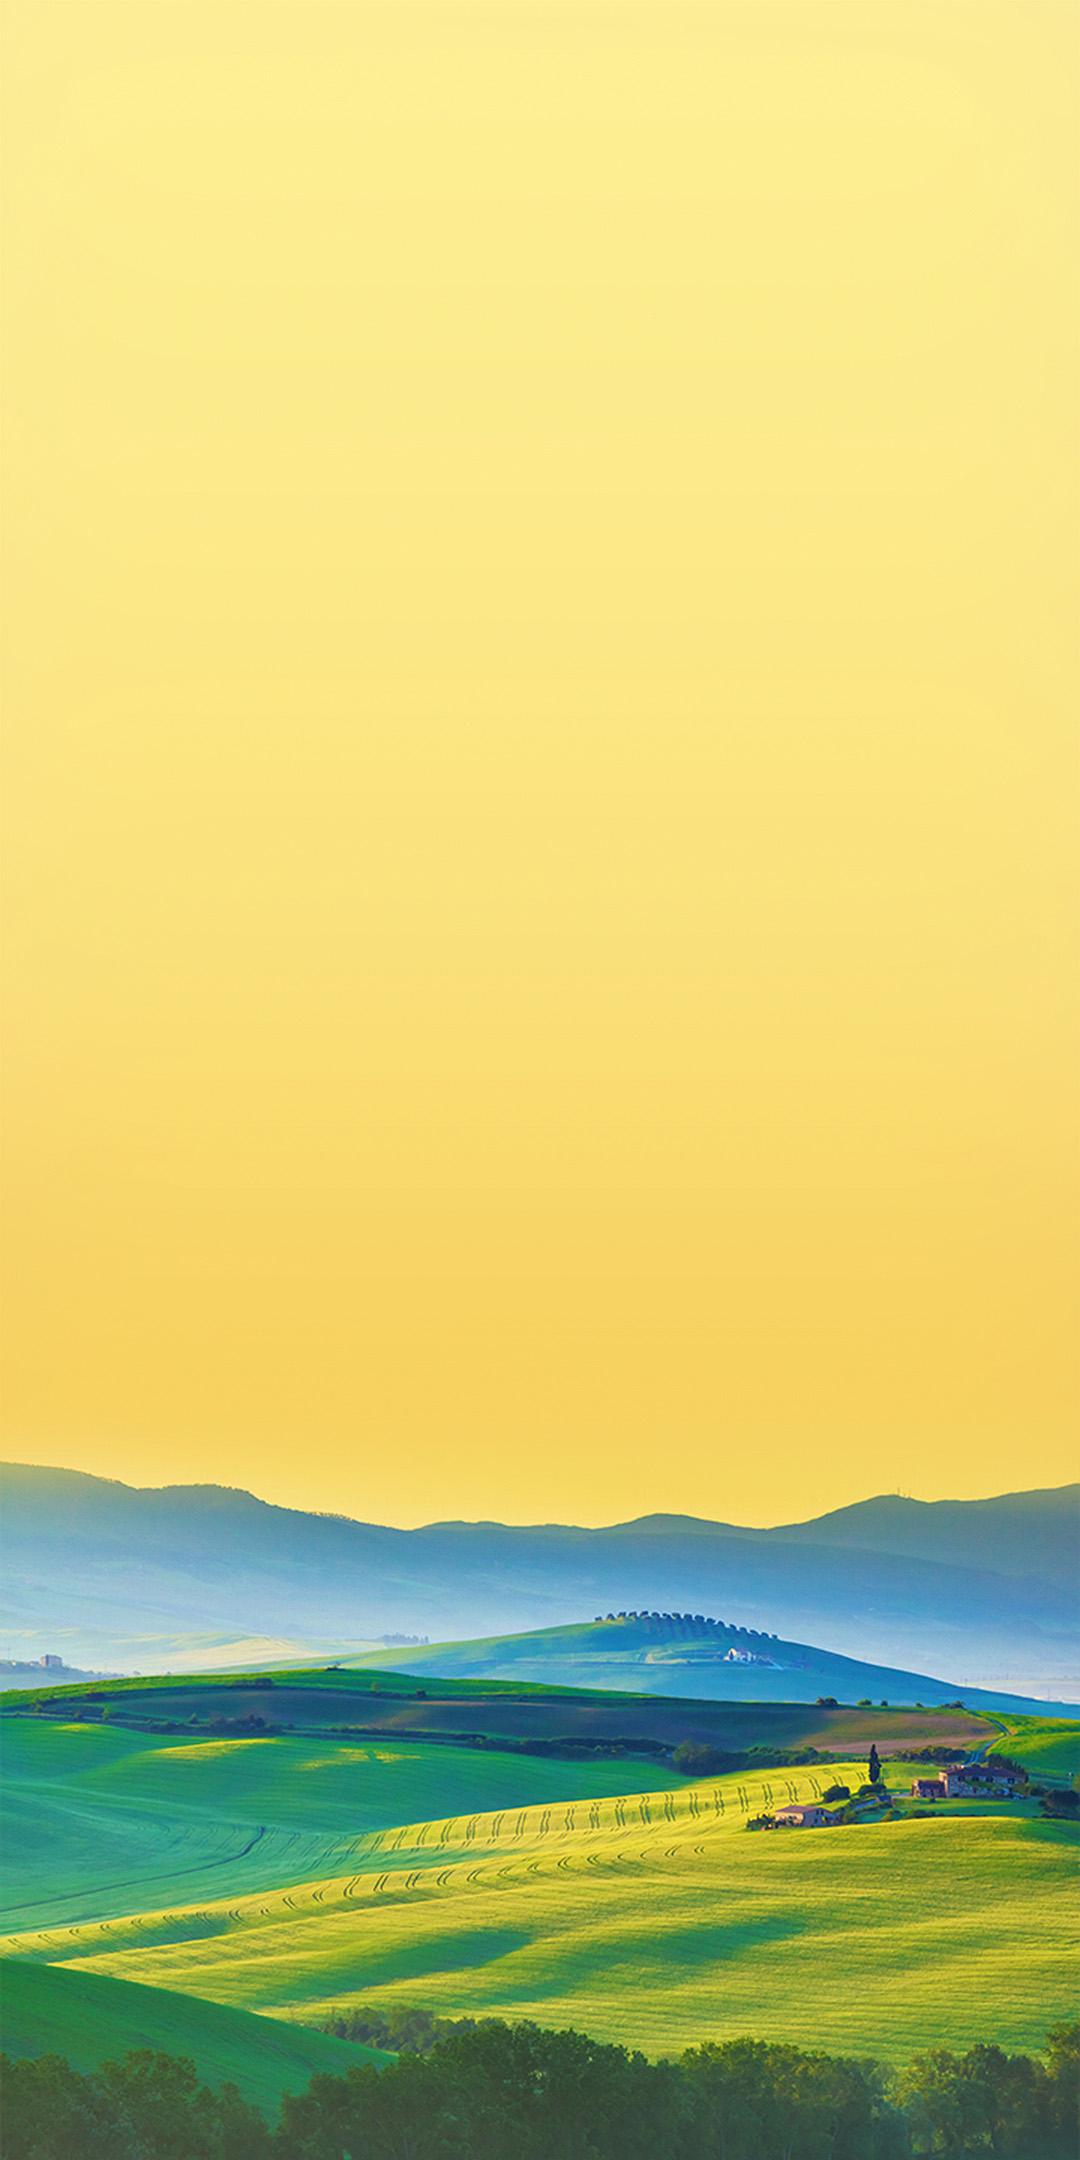 Car Wallpapers Iphone 6 Plus Lg Q6 Stock Wallpaper 14 1080x2160